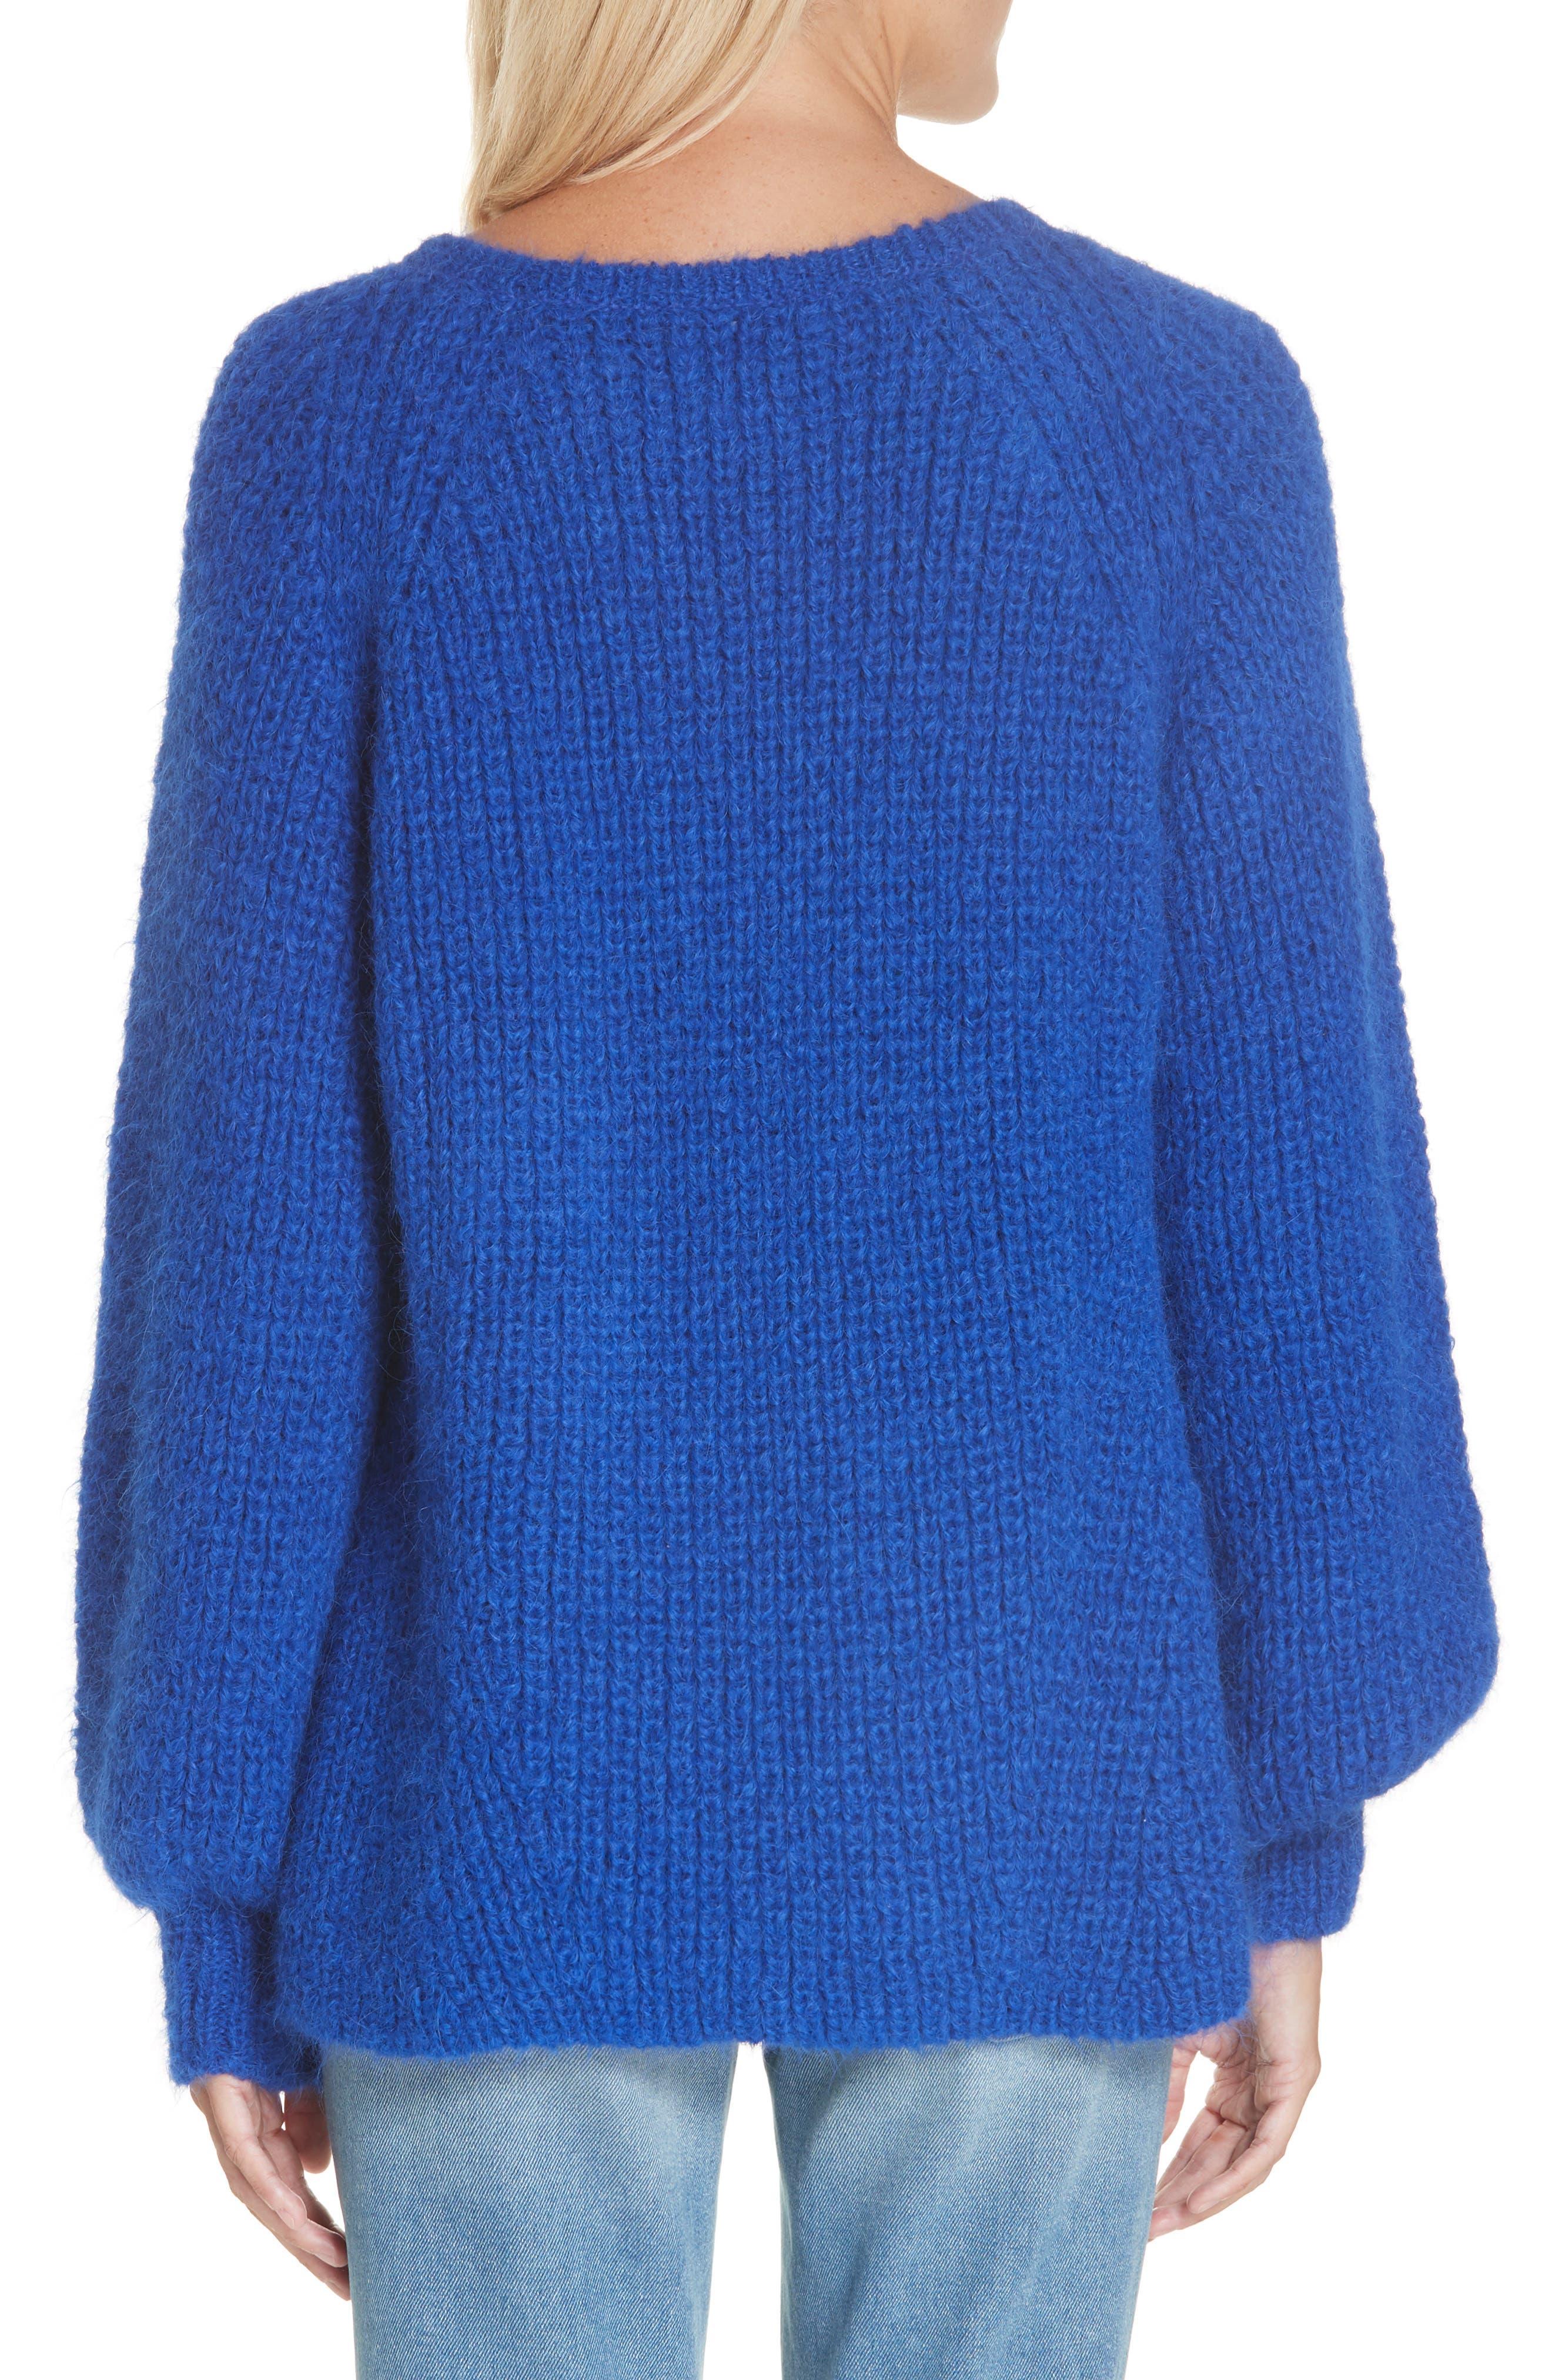 ELEVEN SIX,                             Tess Alpaca & Wool Blend Sweater,                             Alternate thumbnail 2, color,                             COLBOLT BLUE